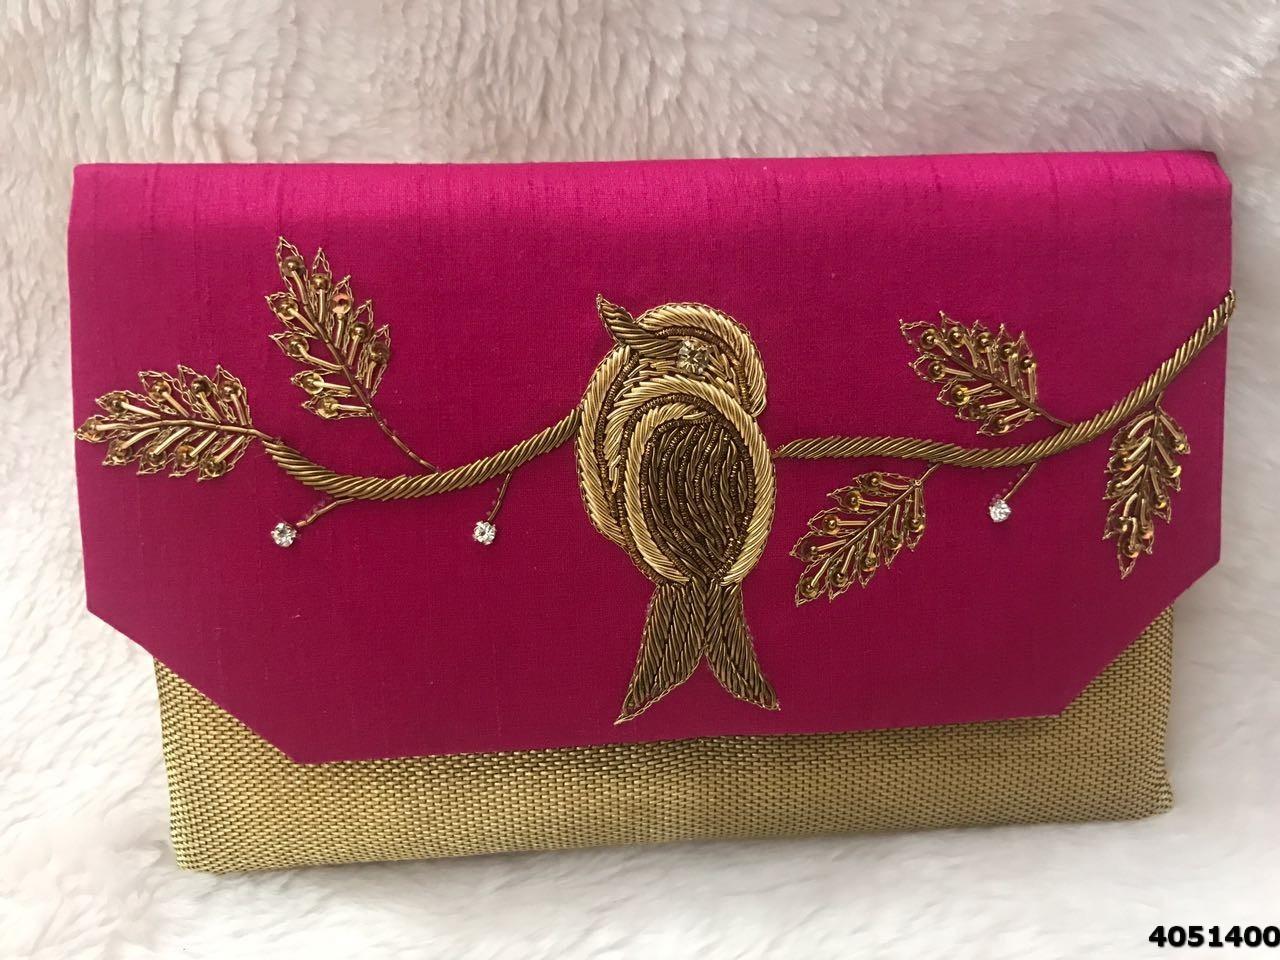 Designer Evening Clutch Bag